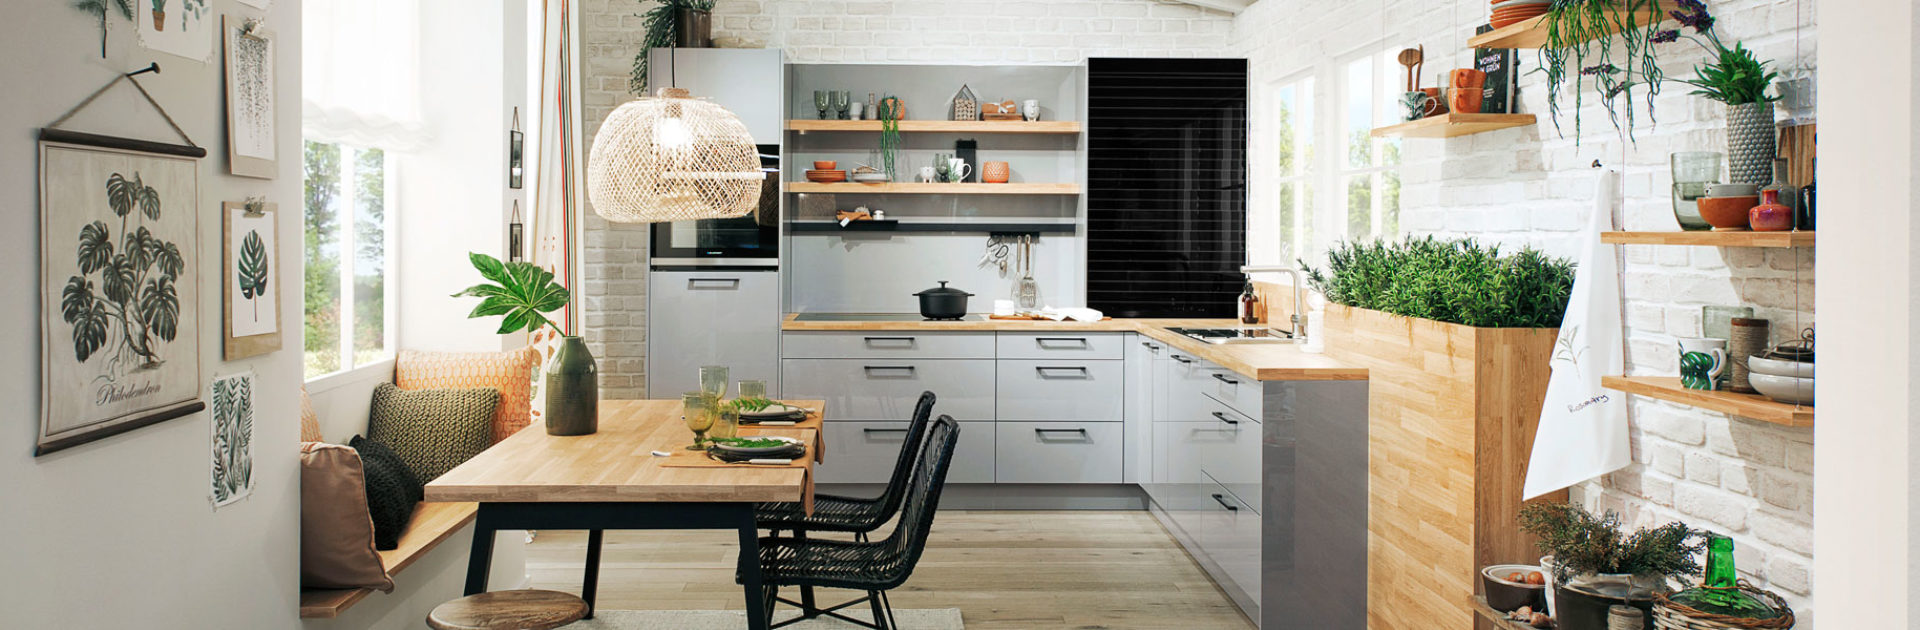 Hoekkeuken | L-keuken | Keuken inspiratie